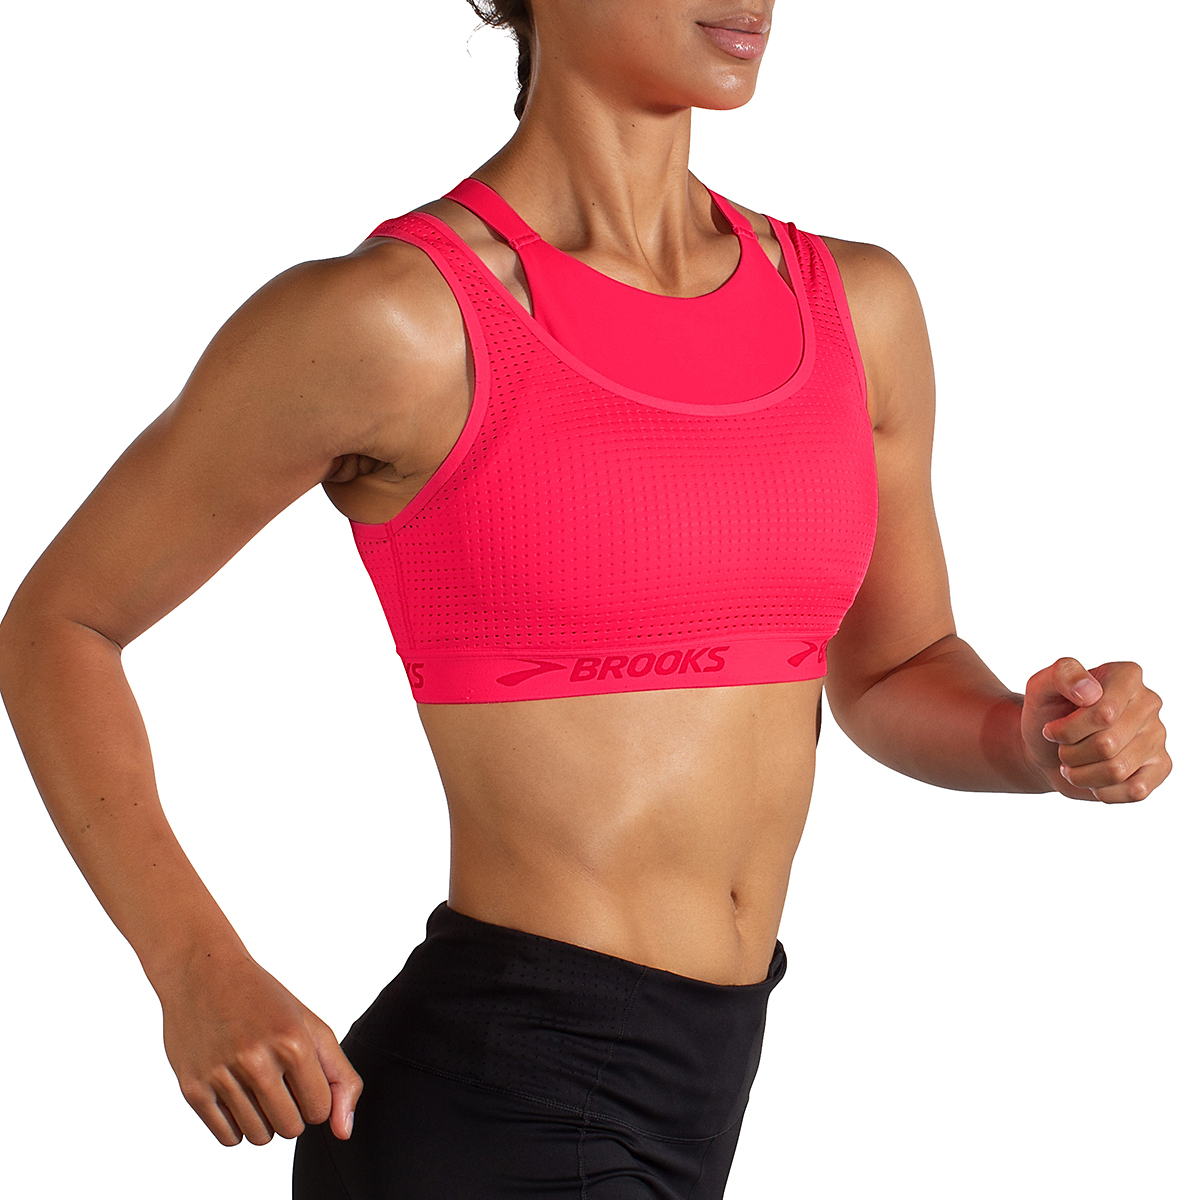 Women's Brooks Drive Mesh Run Bra - Color: Fluoro Pink - Size: XS, Fluoro Pink, large, image 3